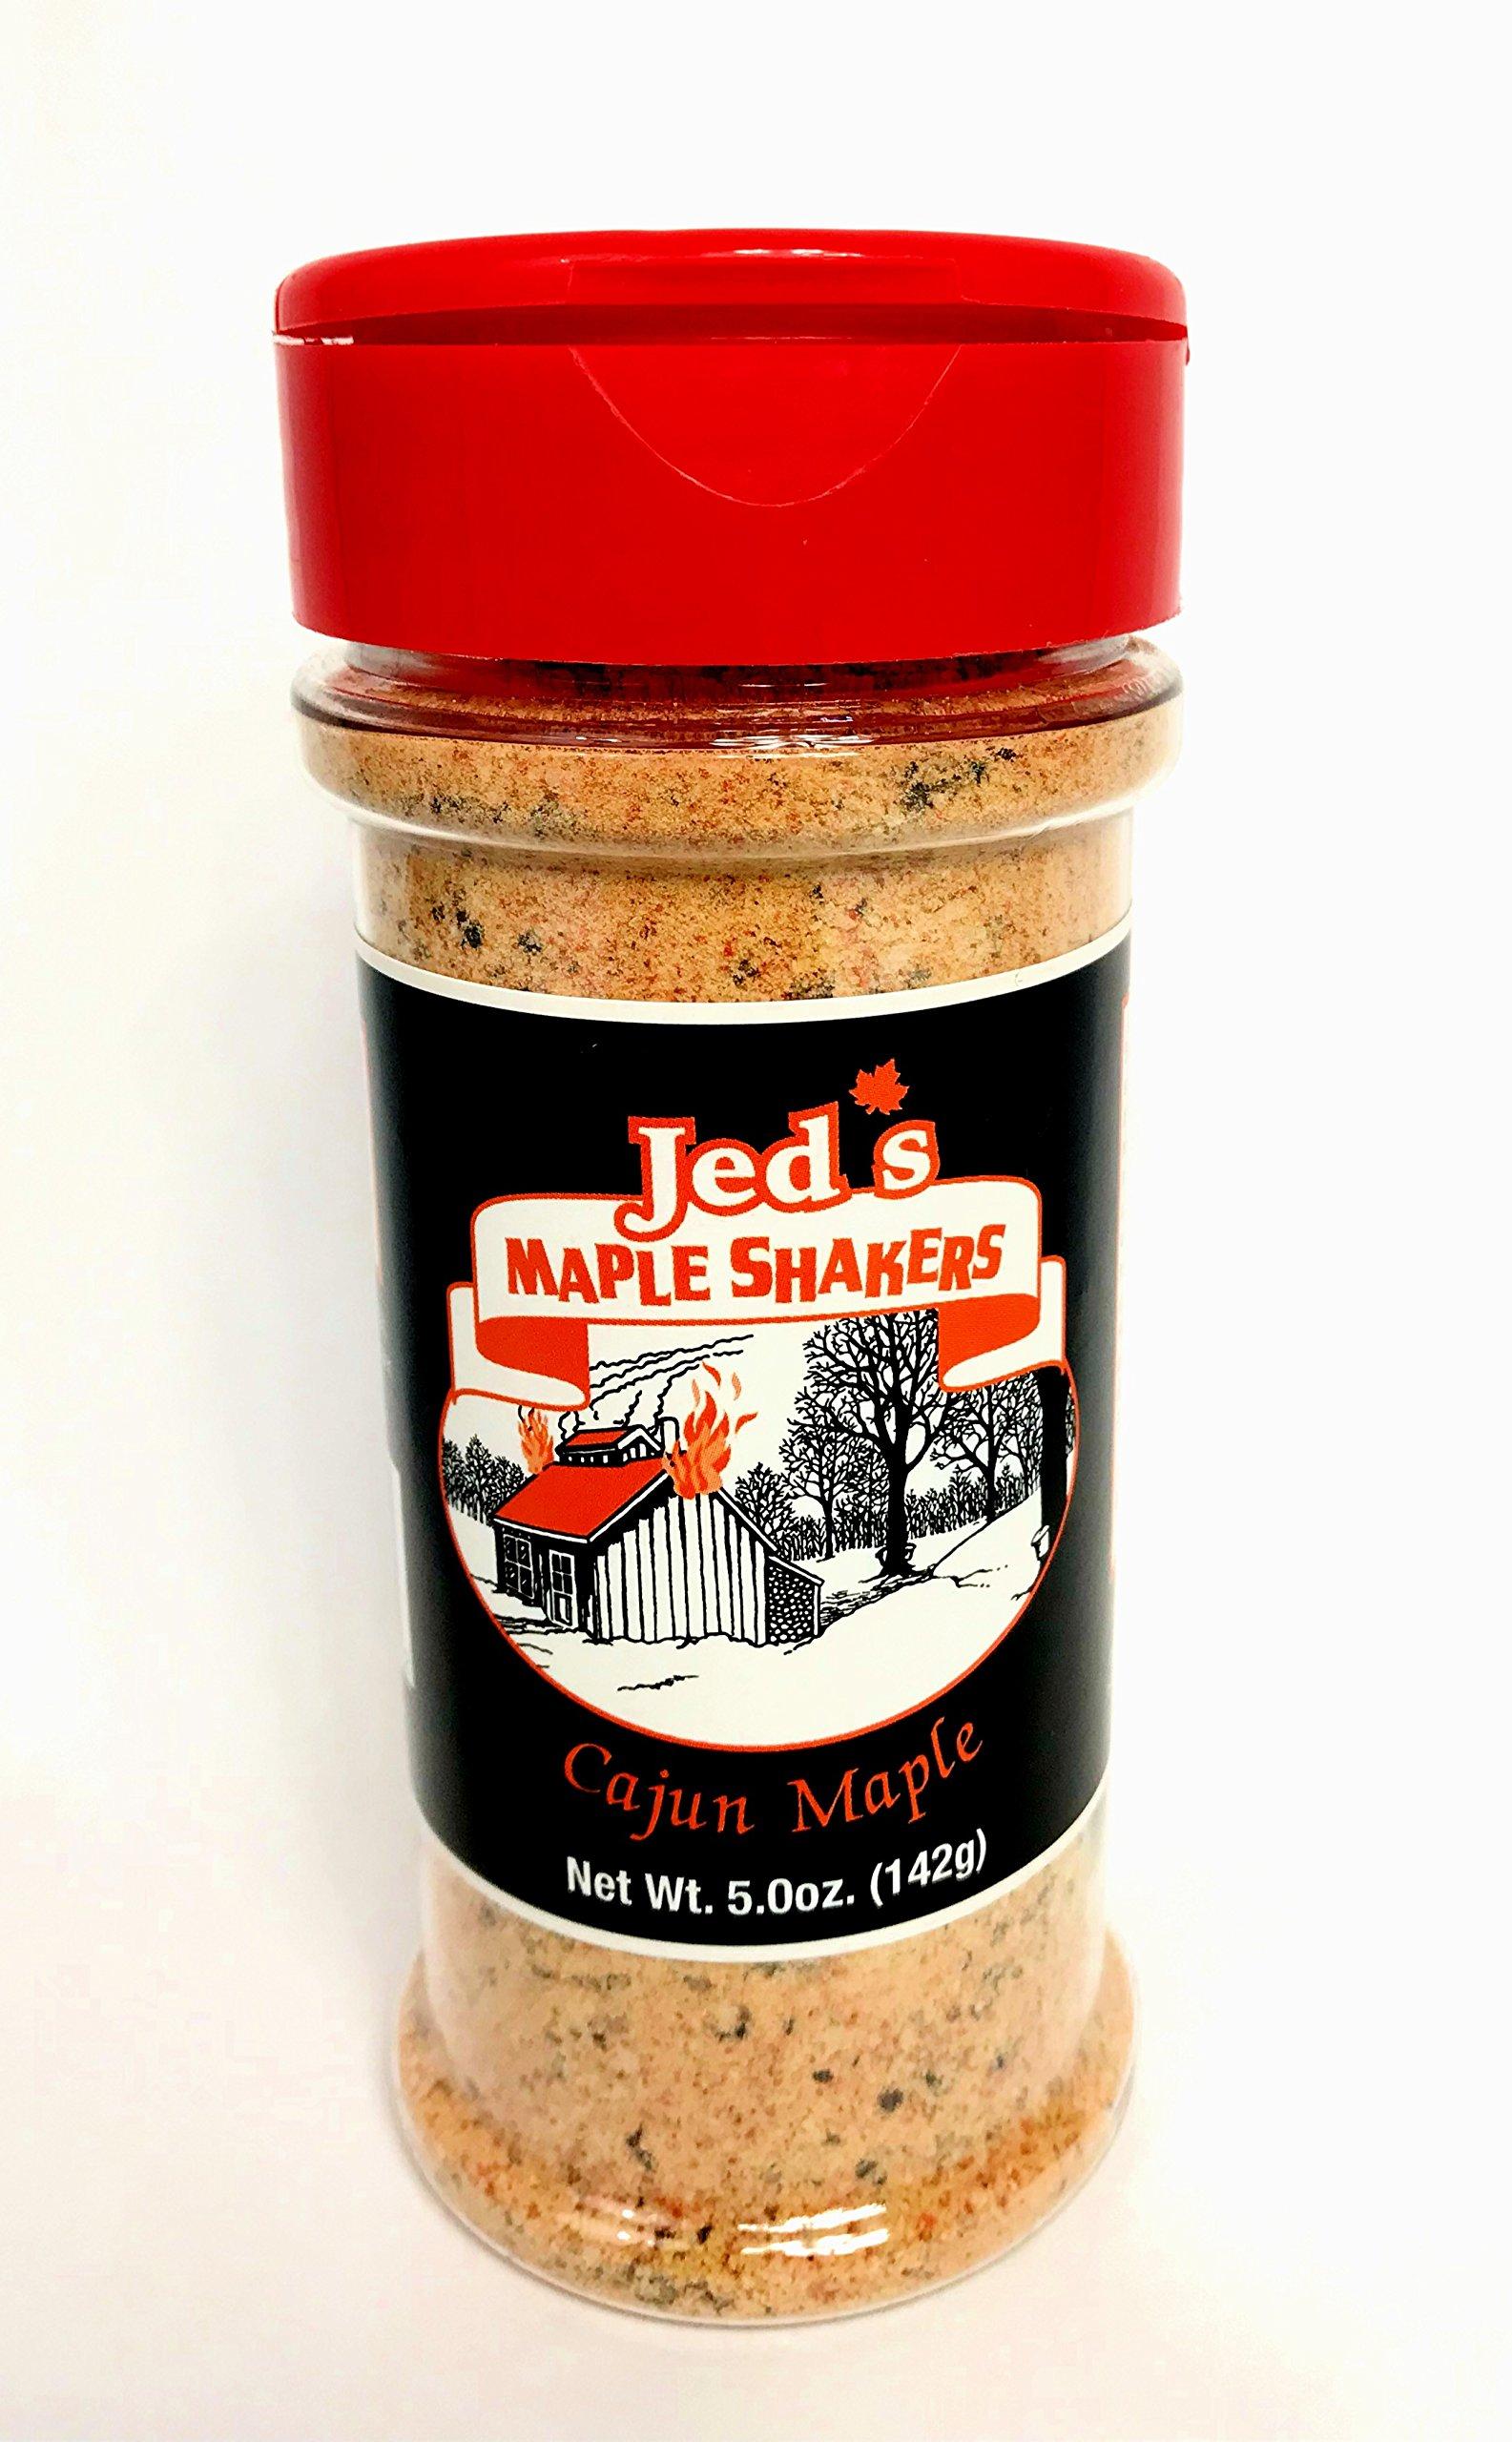 Jed's Cajun Maple Shaker - Seasoning Food - 4.8 oz